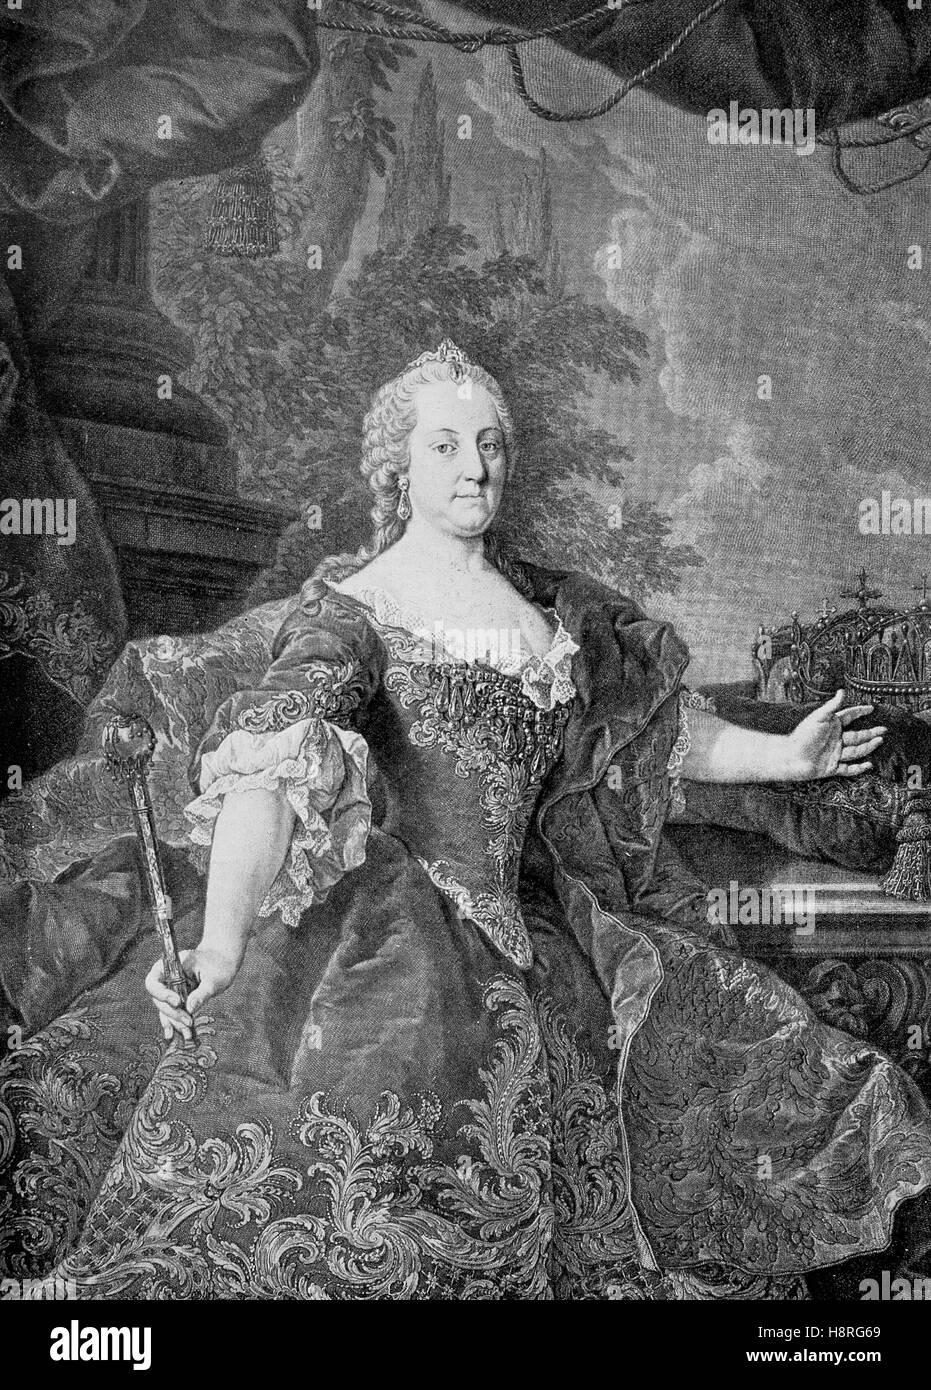 Maria Theresa Walburga Amalia Christina, Maria Theresia, was the only female ruler of the Habsburg dominions and - Stock Image